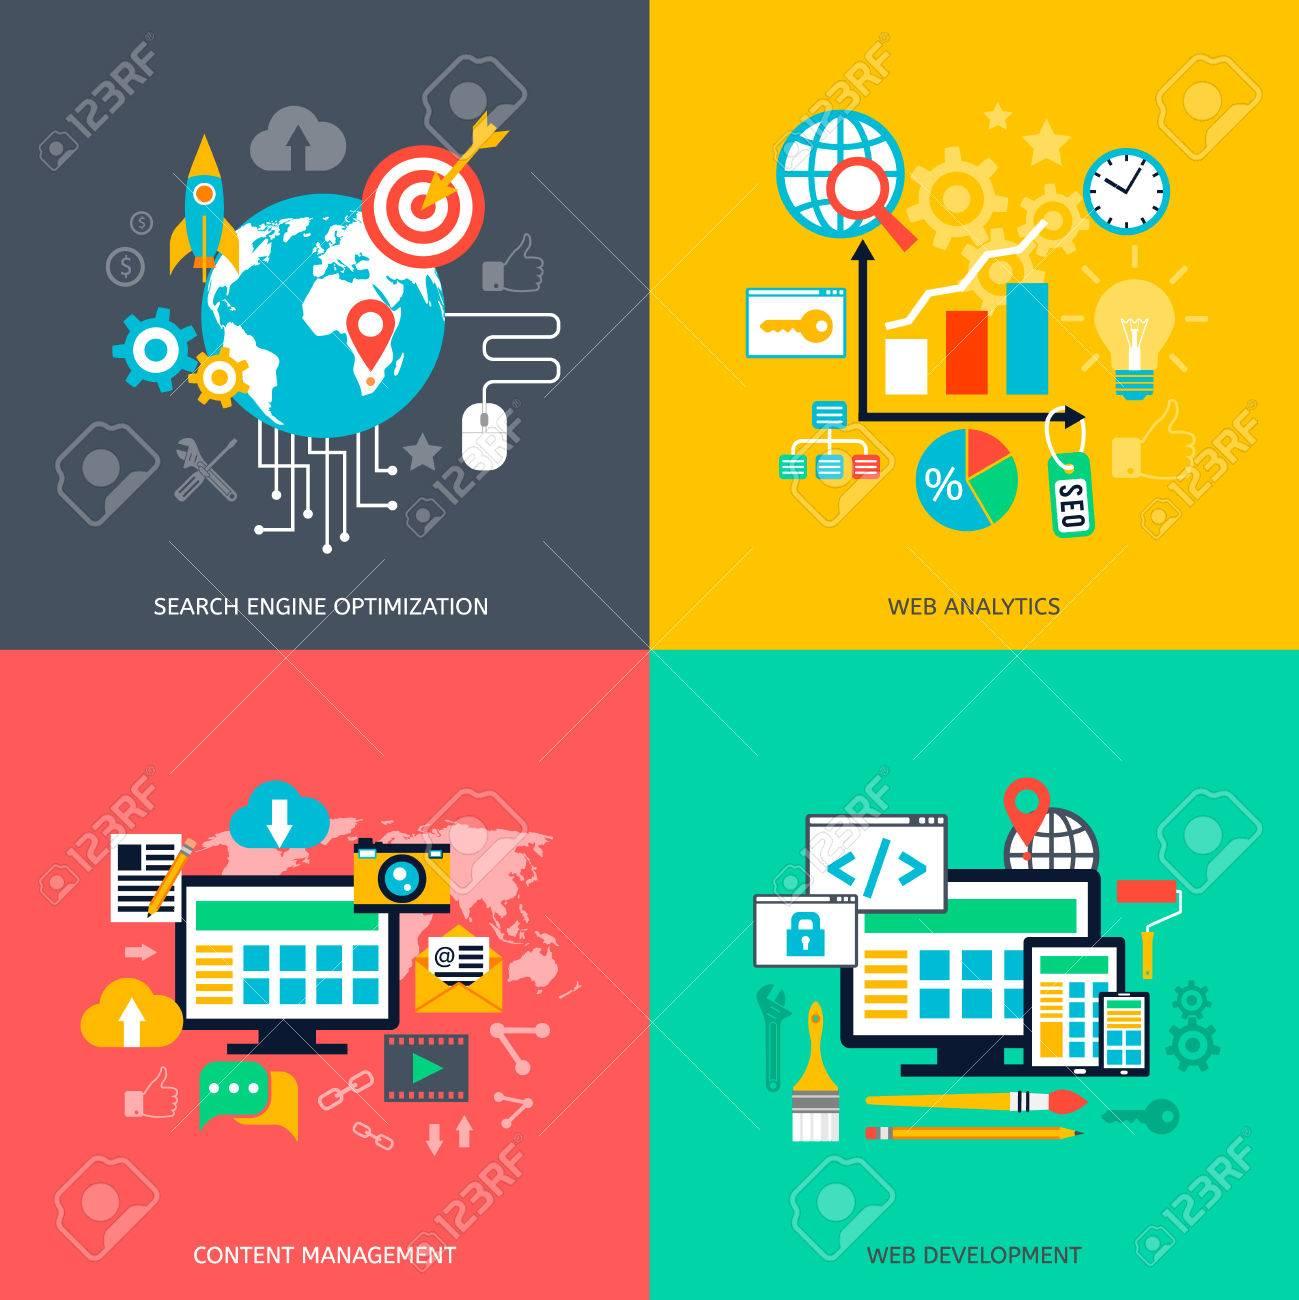 SEO optimization icons. Web development, internet marketing, web design, tags, target stratege, analysis - 41168825